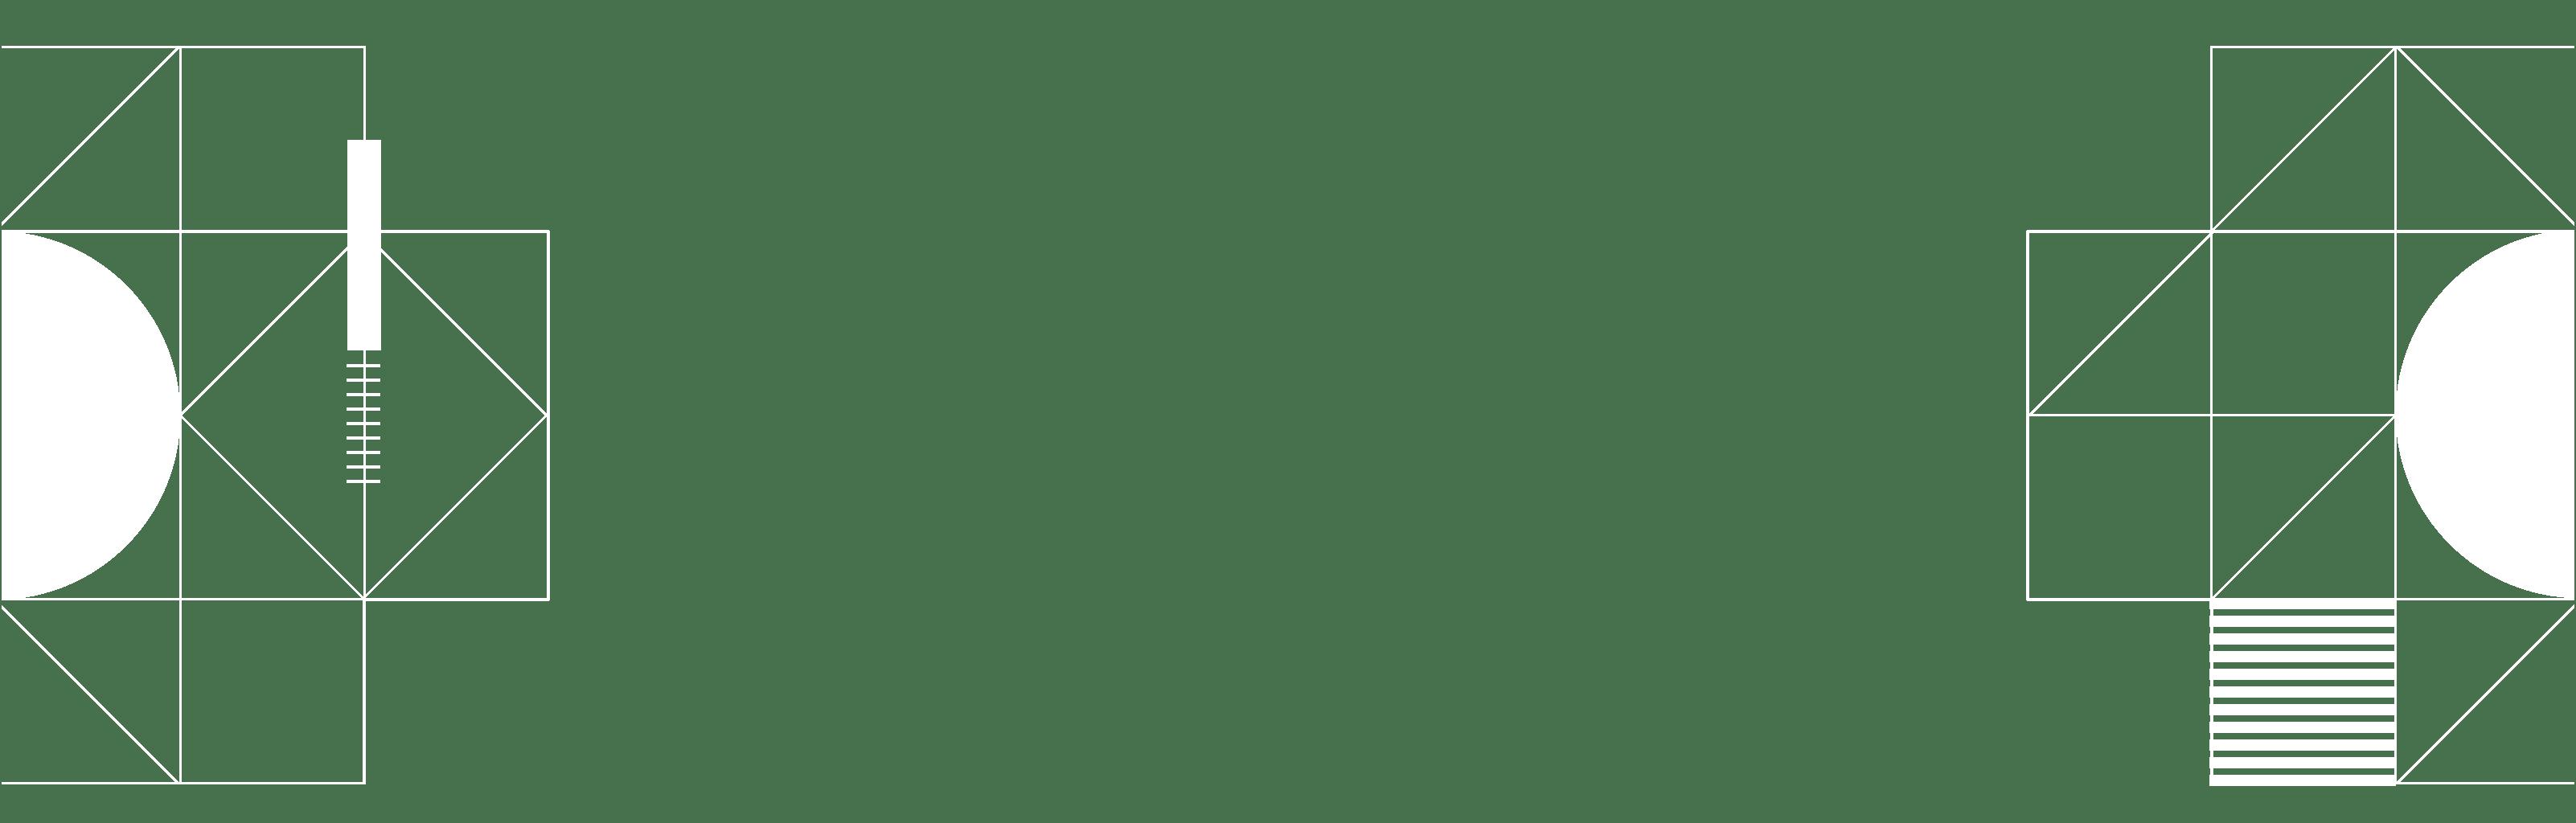 CTA banner 74dd4e1c-233f-4396-b571-90f9f0211dec background